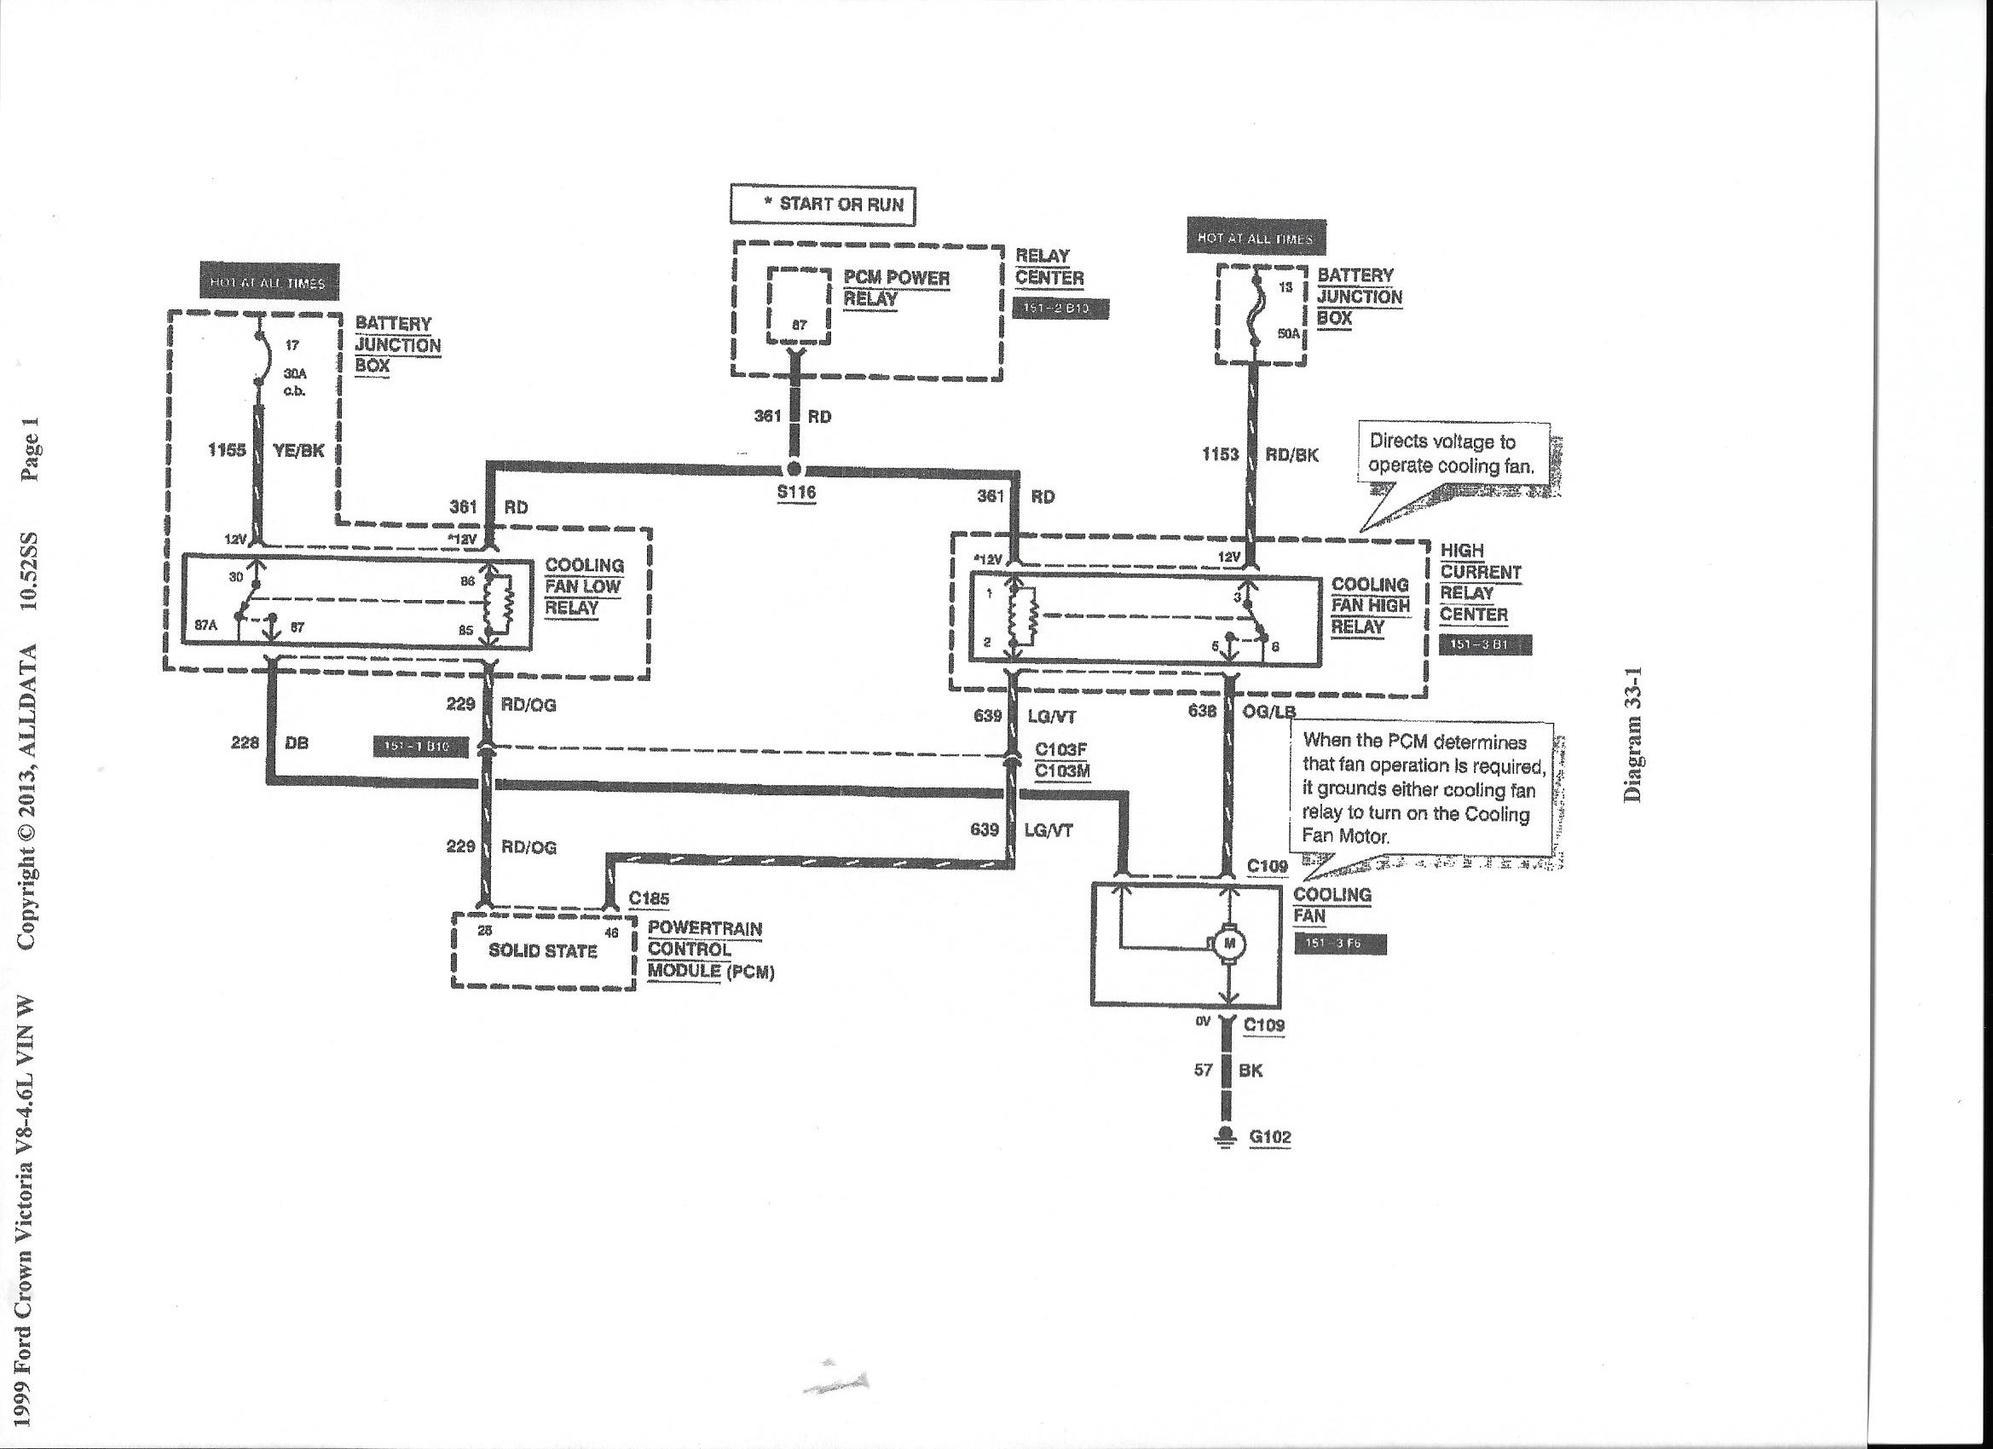 chevy trailblazer hvac diagram